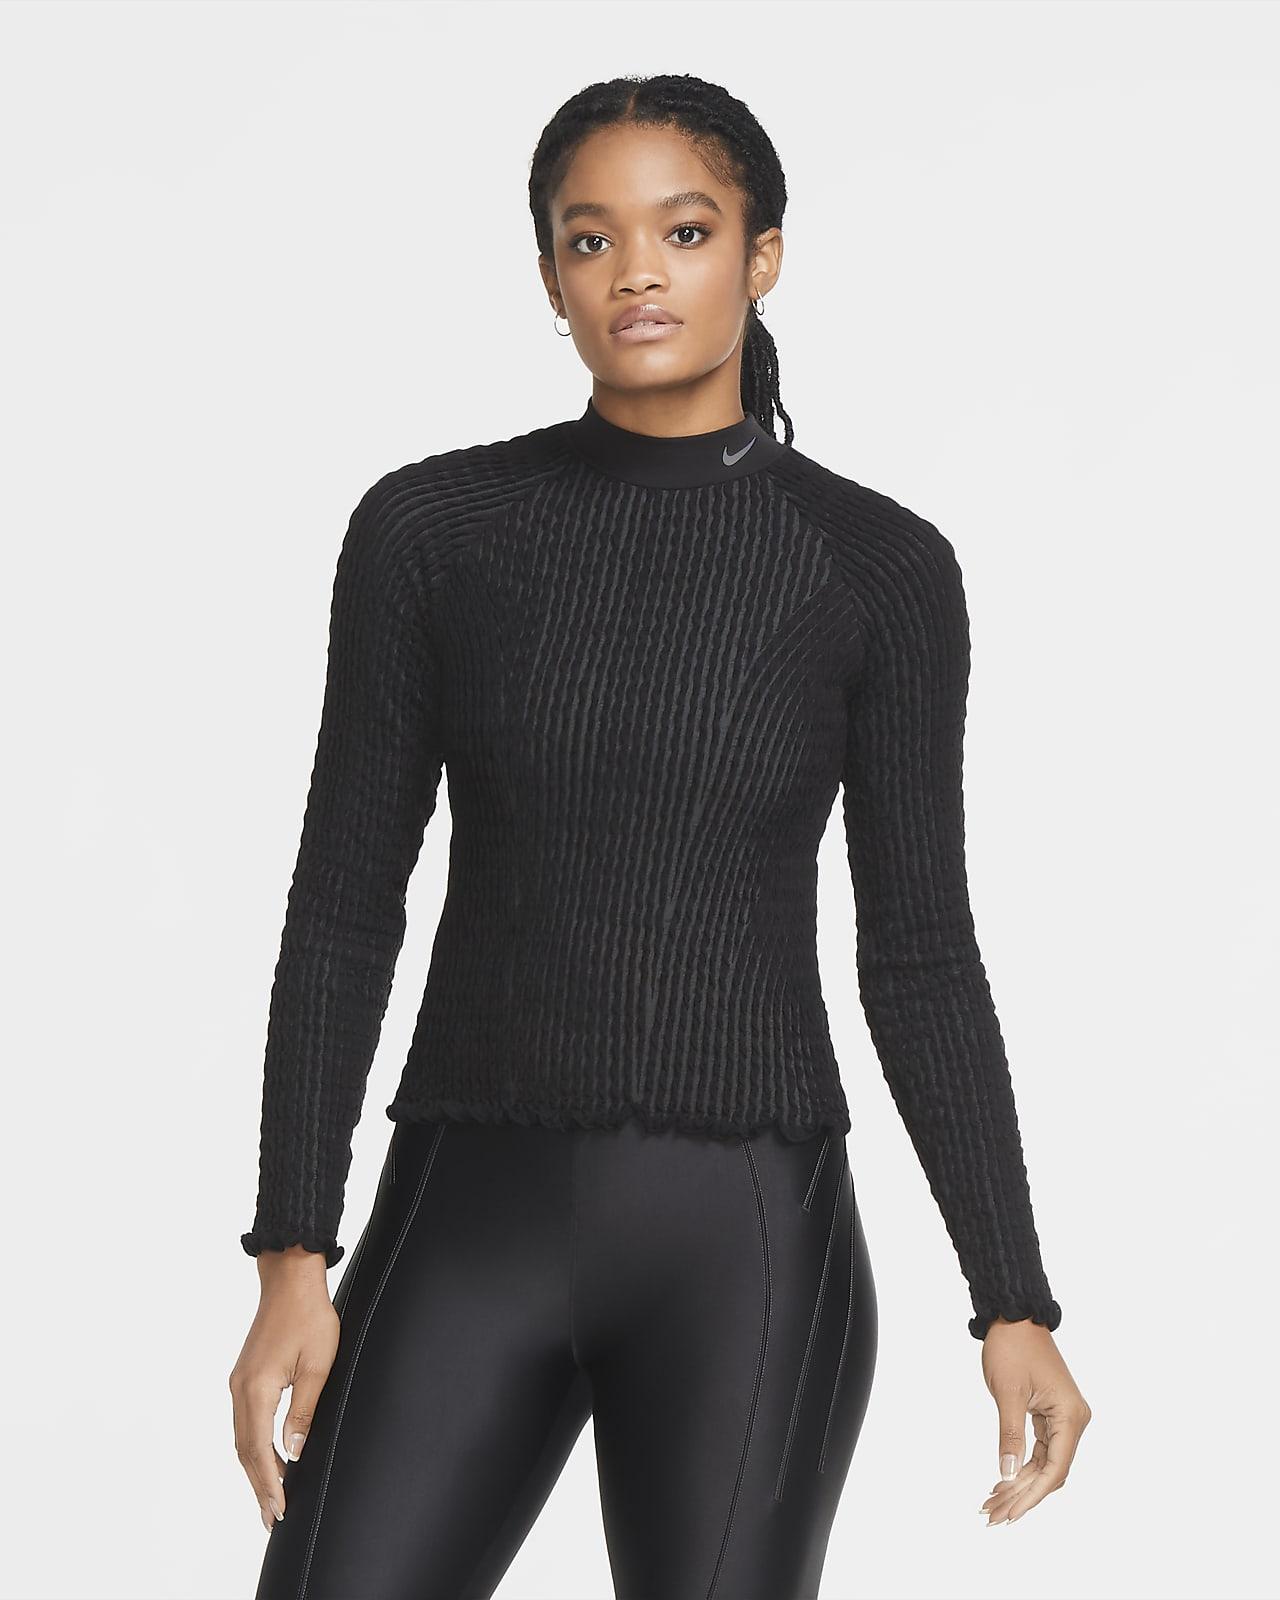 Nike City Ready Women's Seamless Long-Sleeve Top